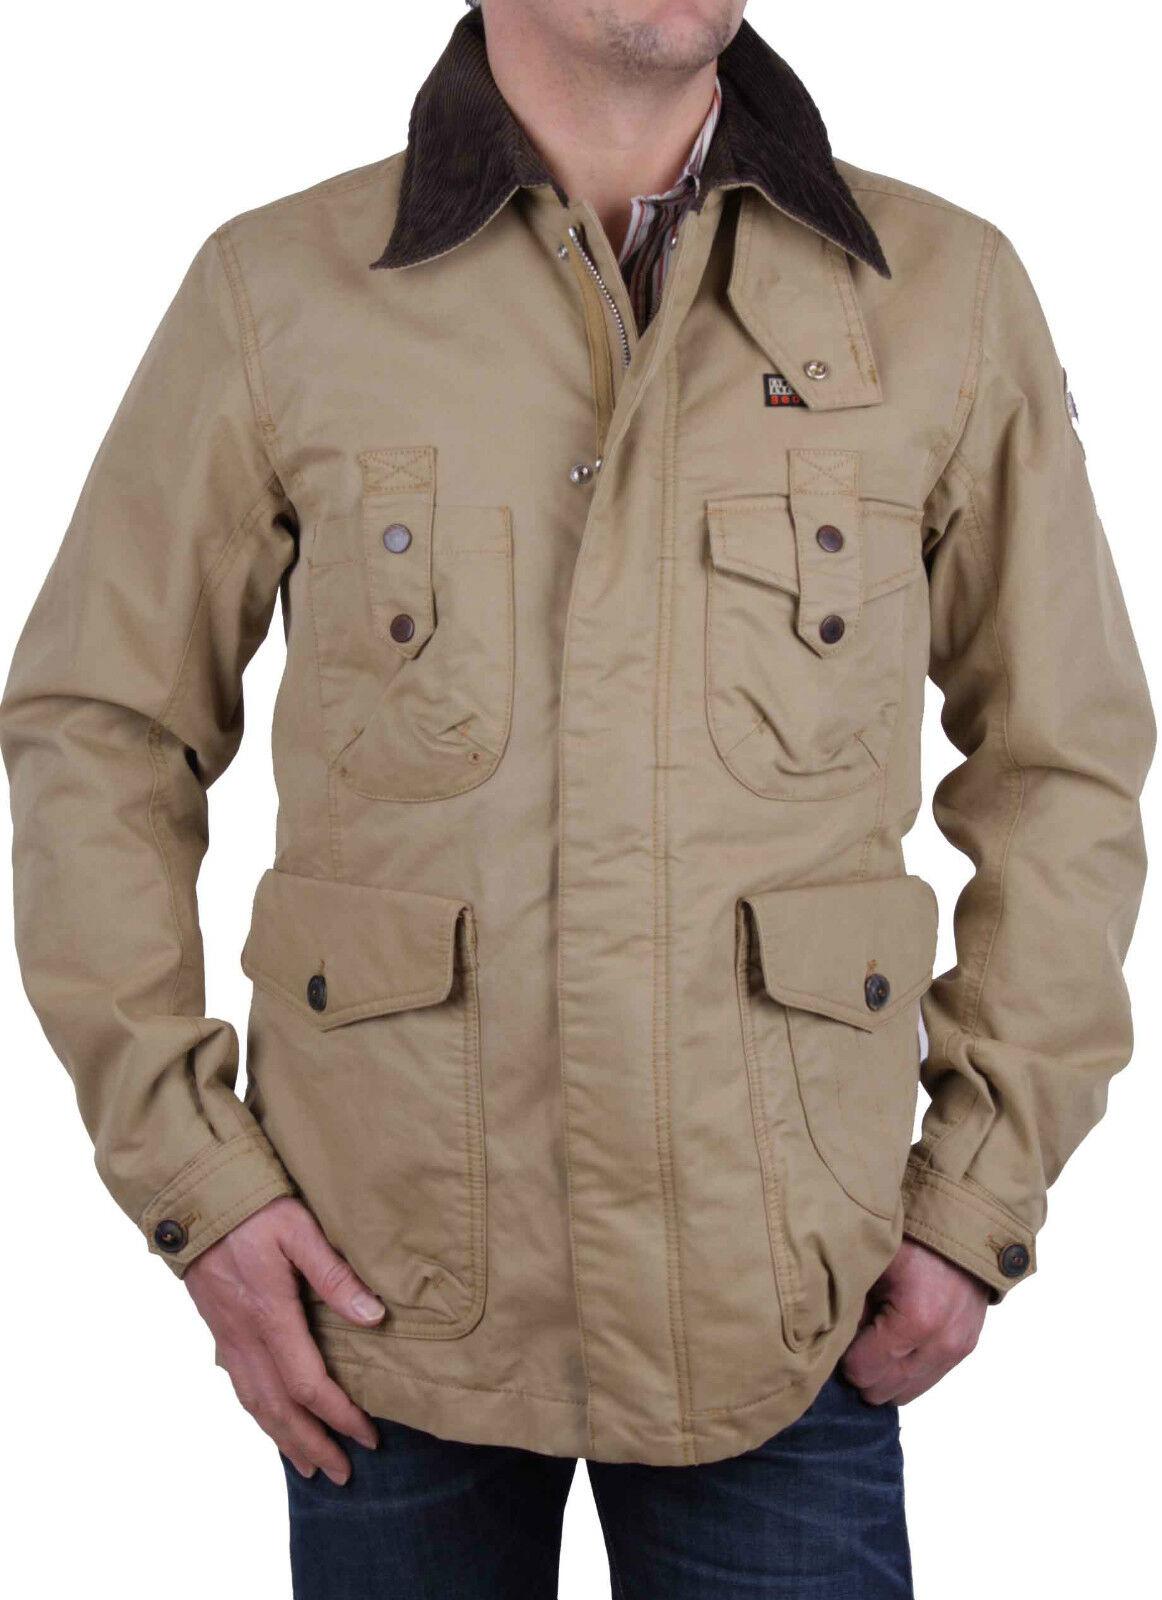 NAPAPIJRI Hommes veste parka beige taille s-xxl #rif44 #rif44 s-xxl 8849c4